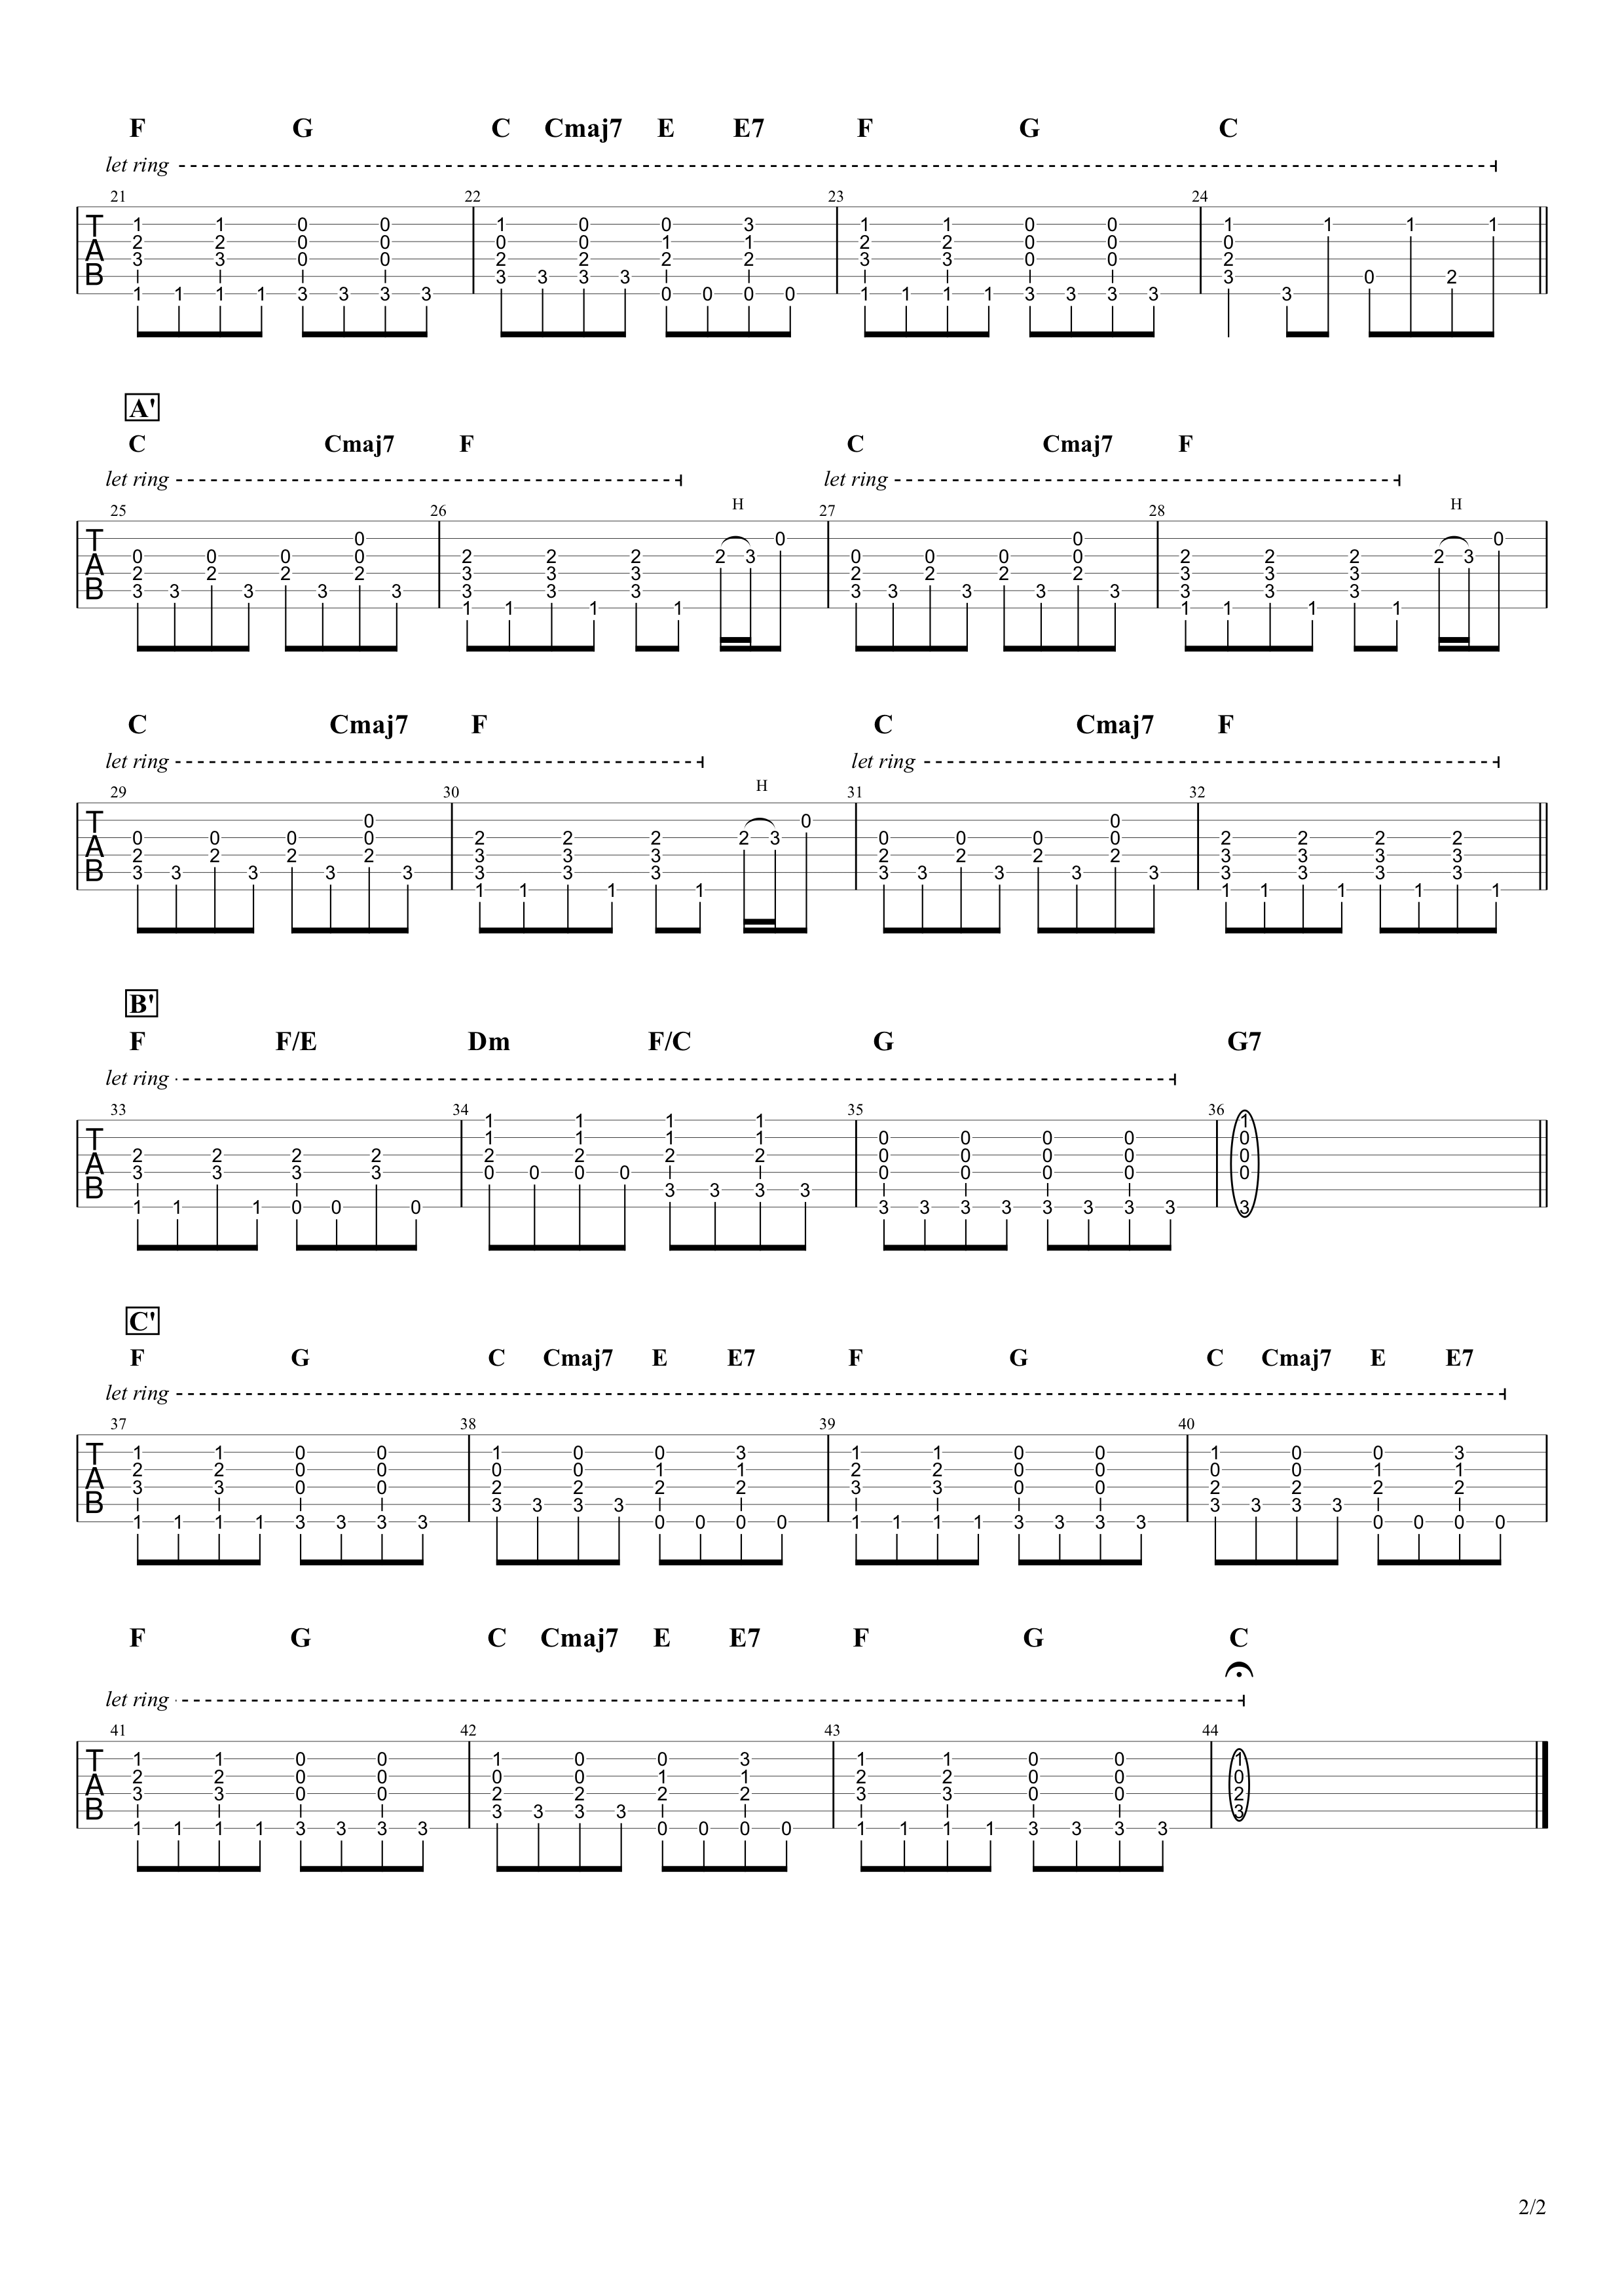 Imagine/John Lennon ギタータブ譜02